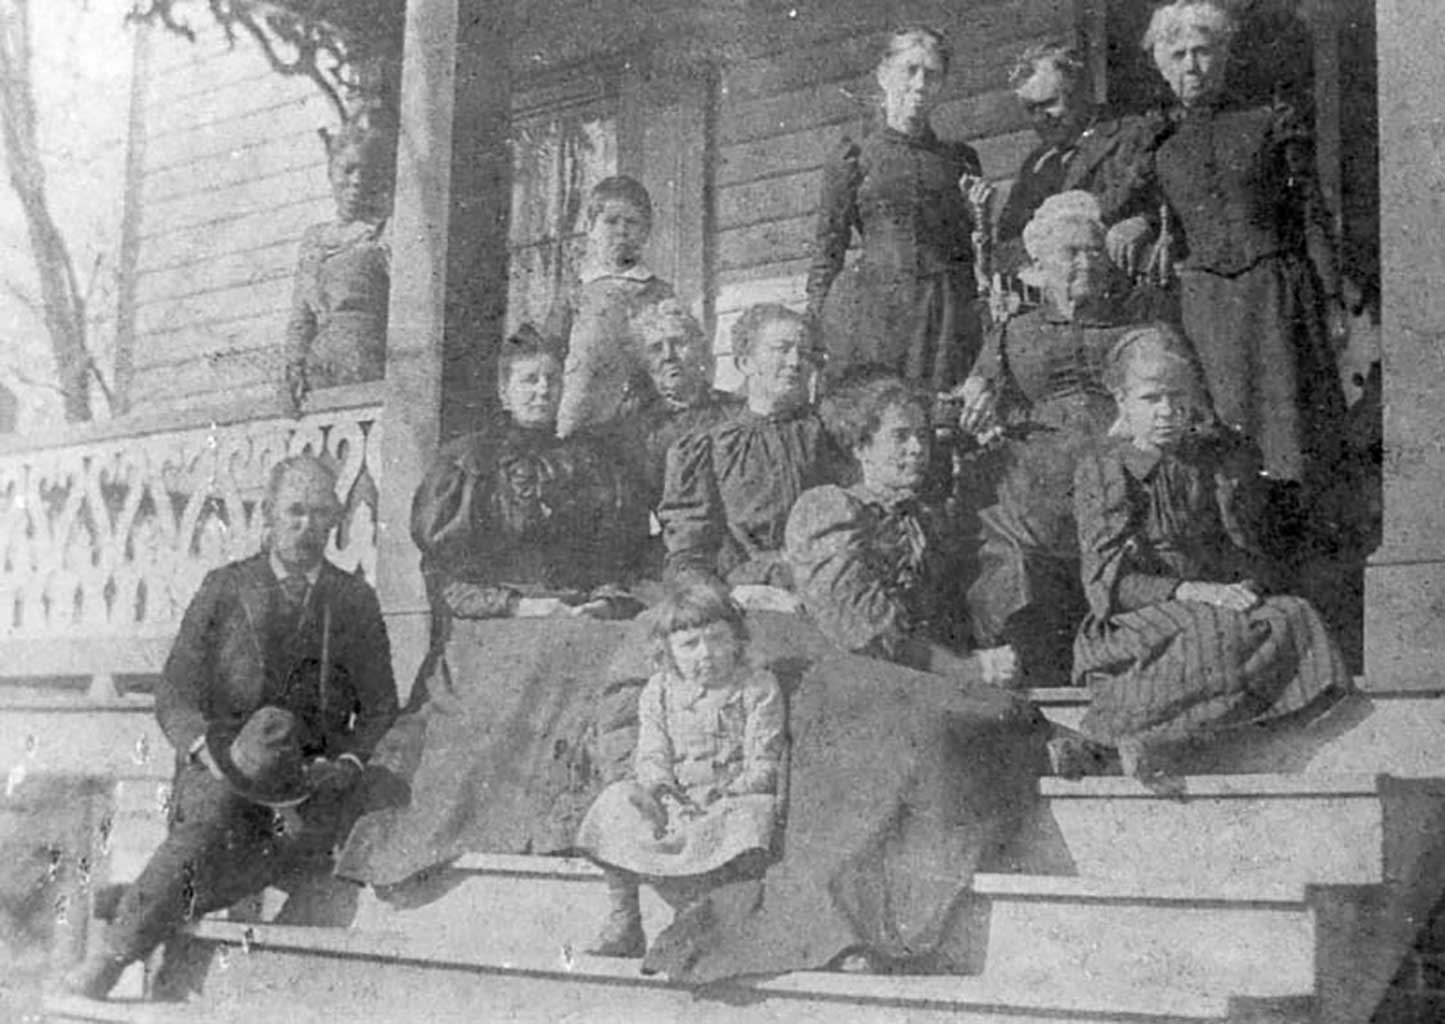 jj-kirk-family-including-inlaws-c-1892-img253